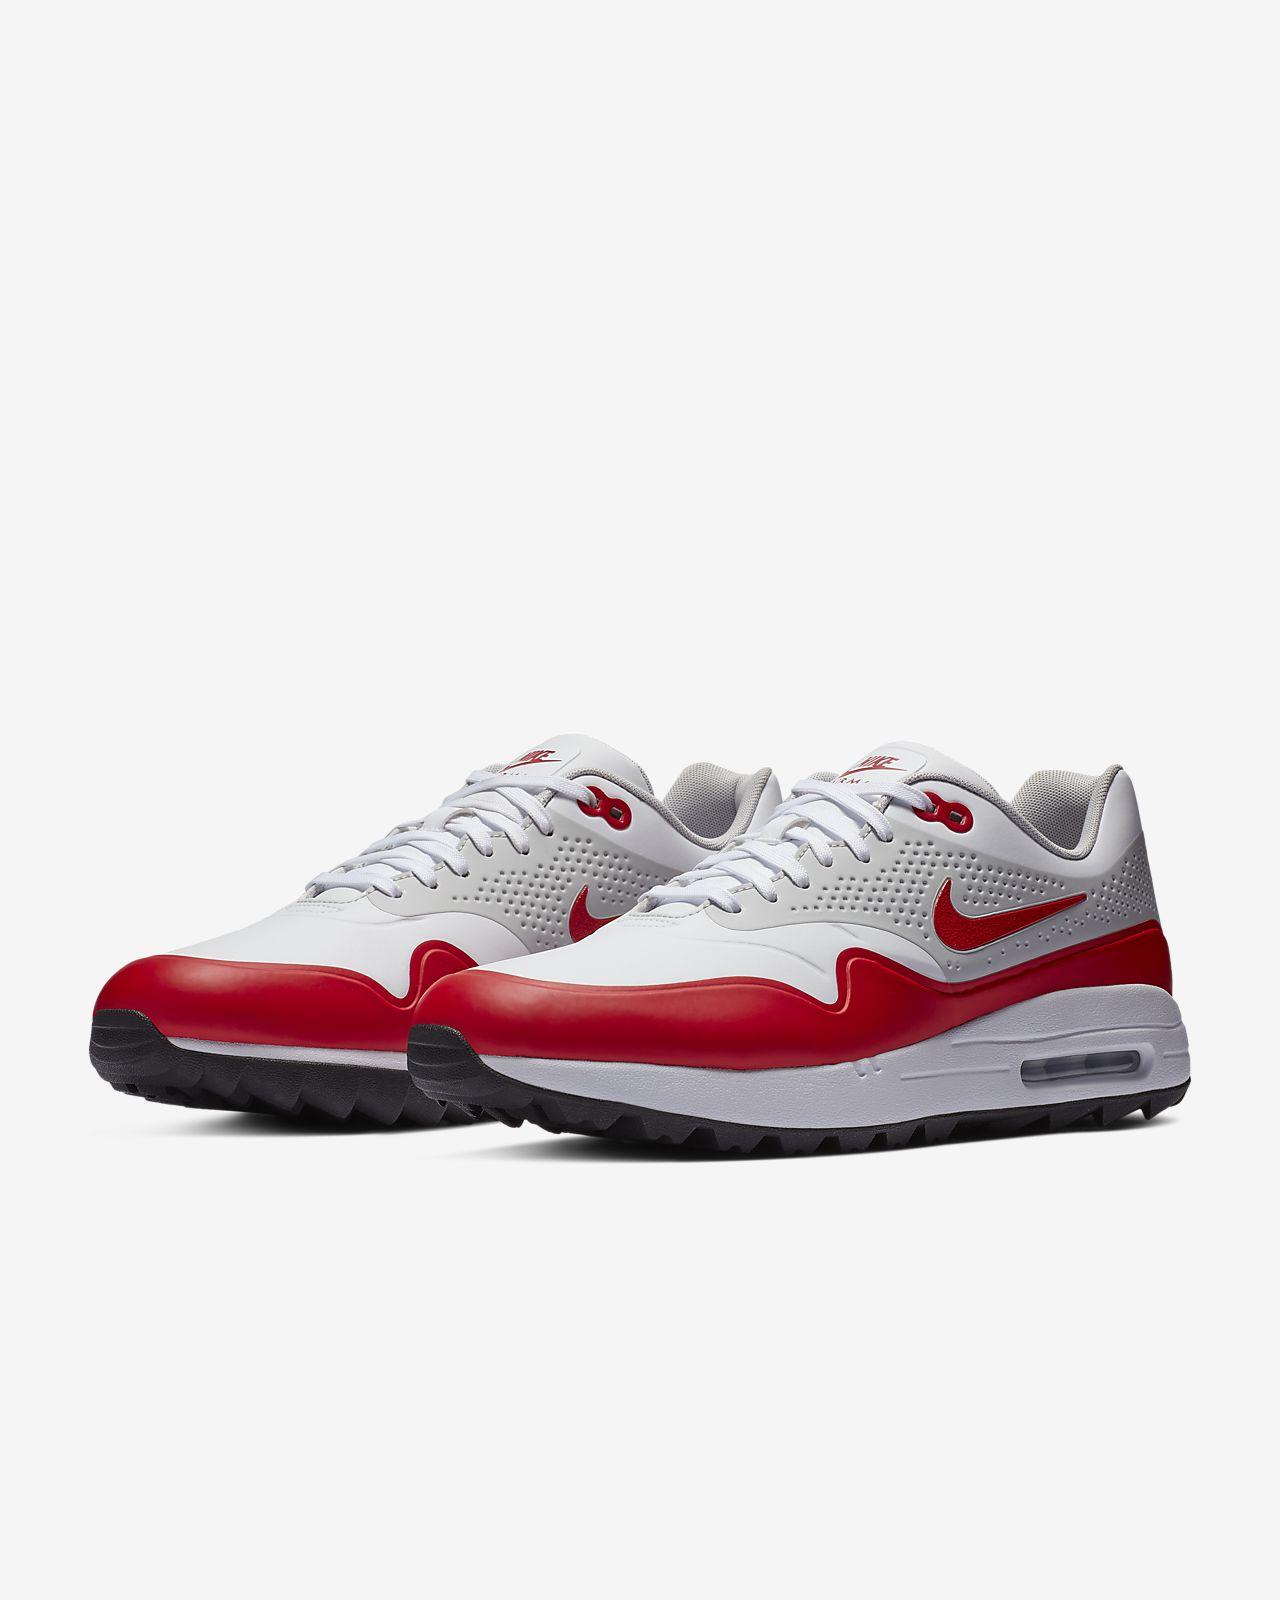 sports shoes ccf60 16e2b ... Chaussure de golf Nike Air Max 1 G pour Homme